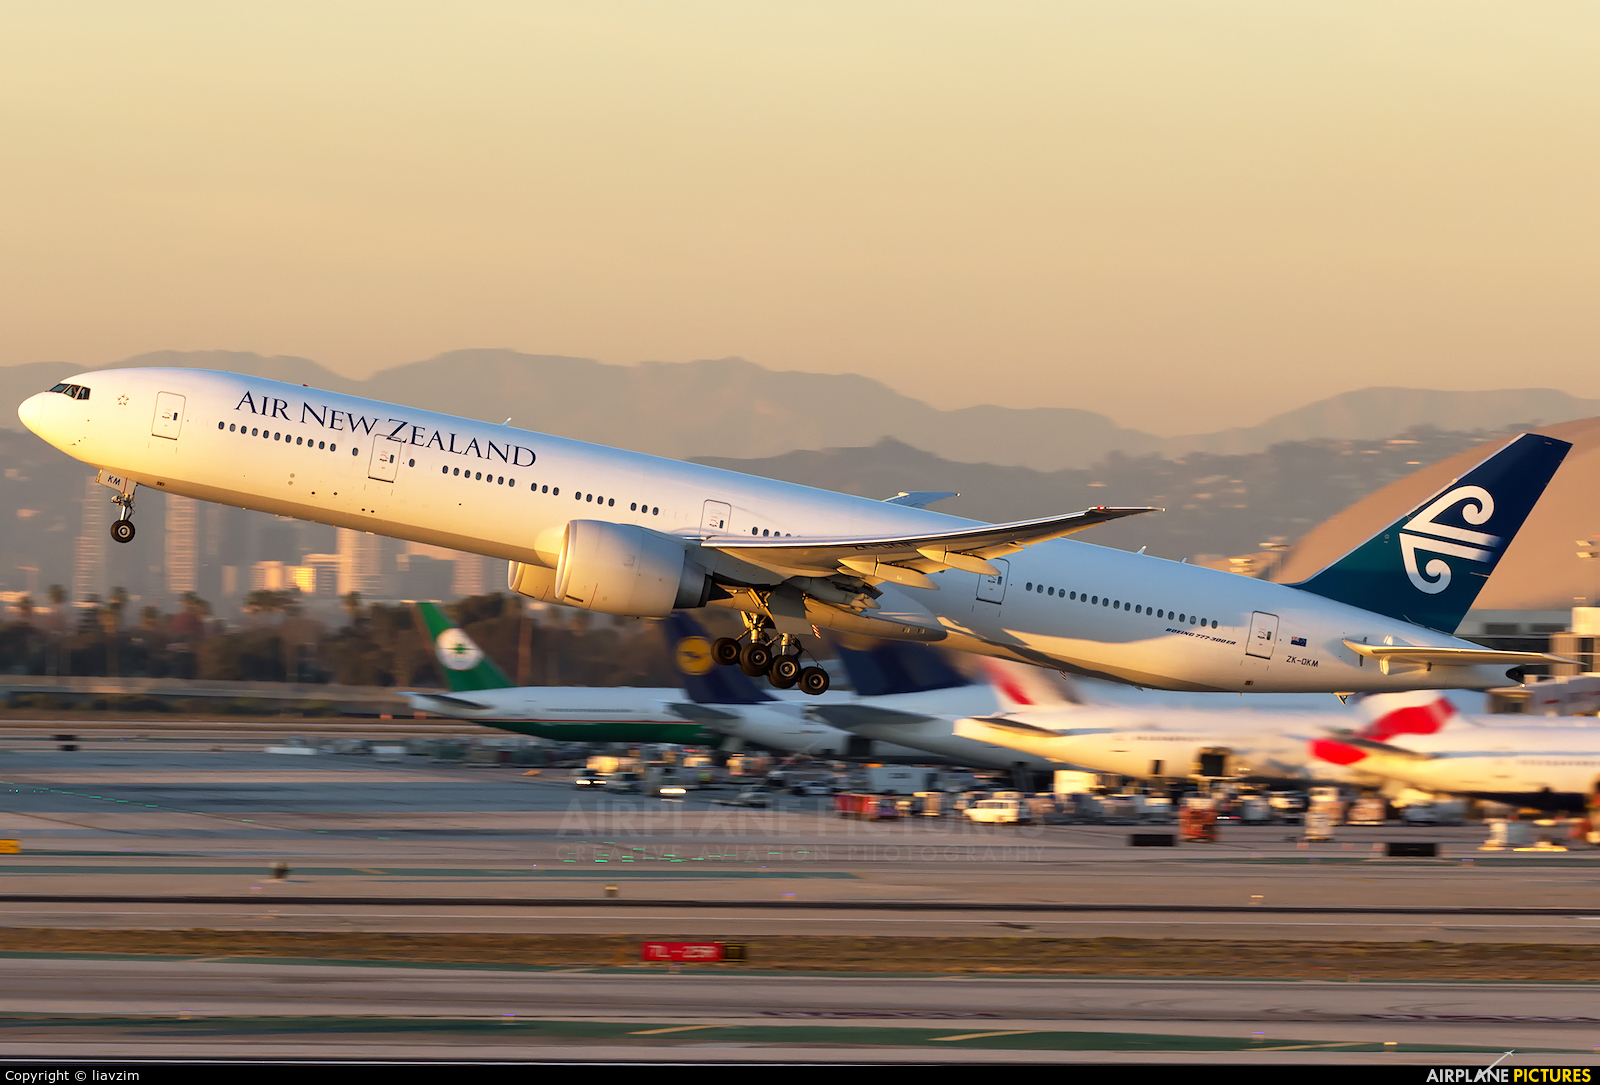 Air New Zealand ZK-OKM aircraft at Los Angeles Intl